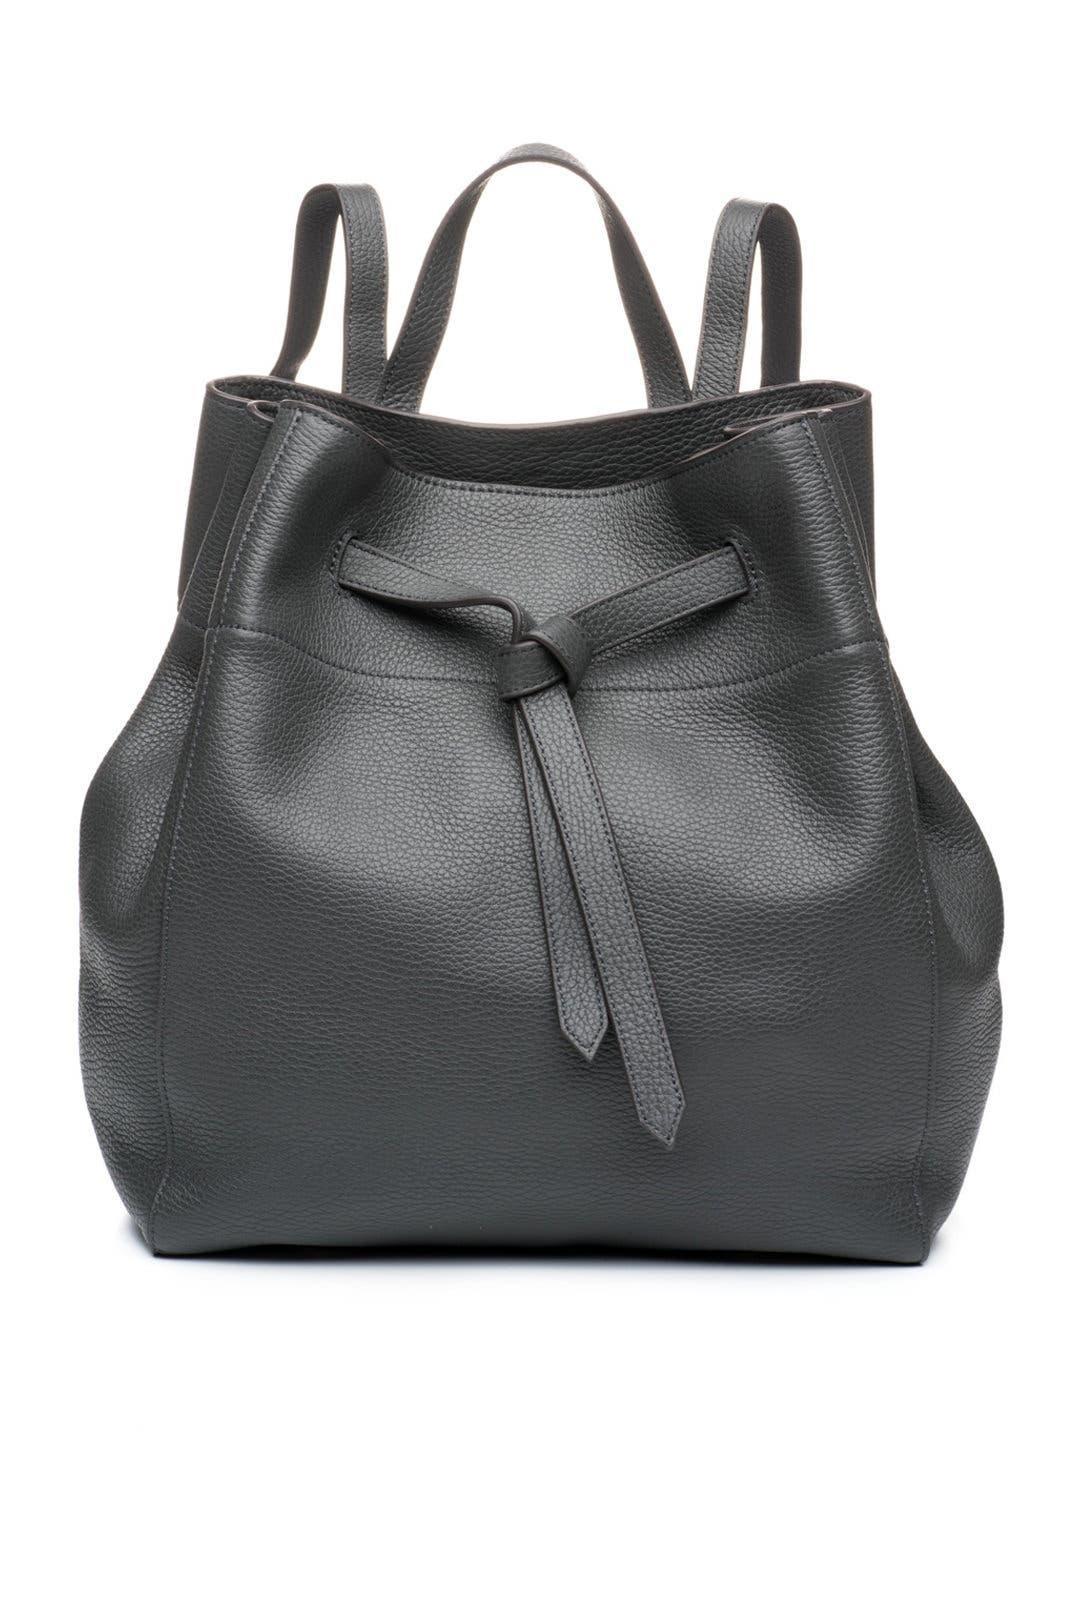 Georgia Drawstring Tote Zinc   Bags, Tote, Bag lady